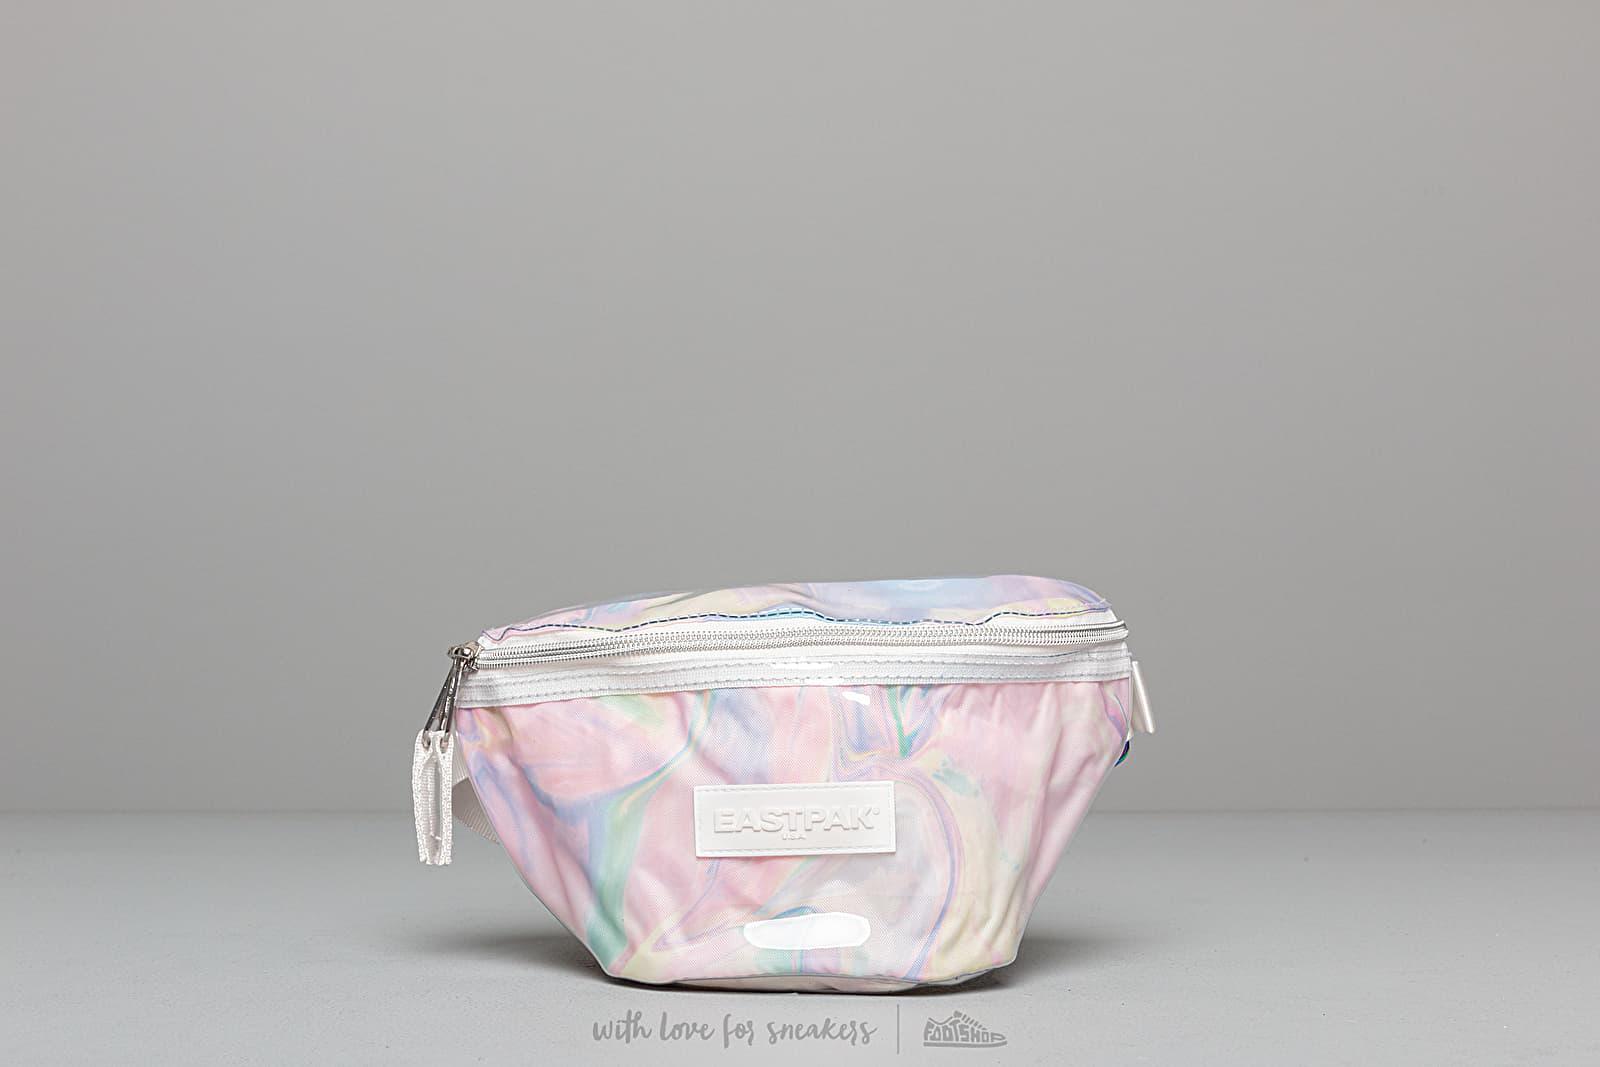 EASTPAK Springer Weistbag Marble Transparent za skvelú cenu 72 € kúpite na Footshop.sk